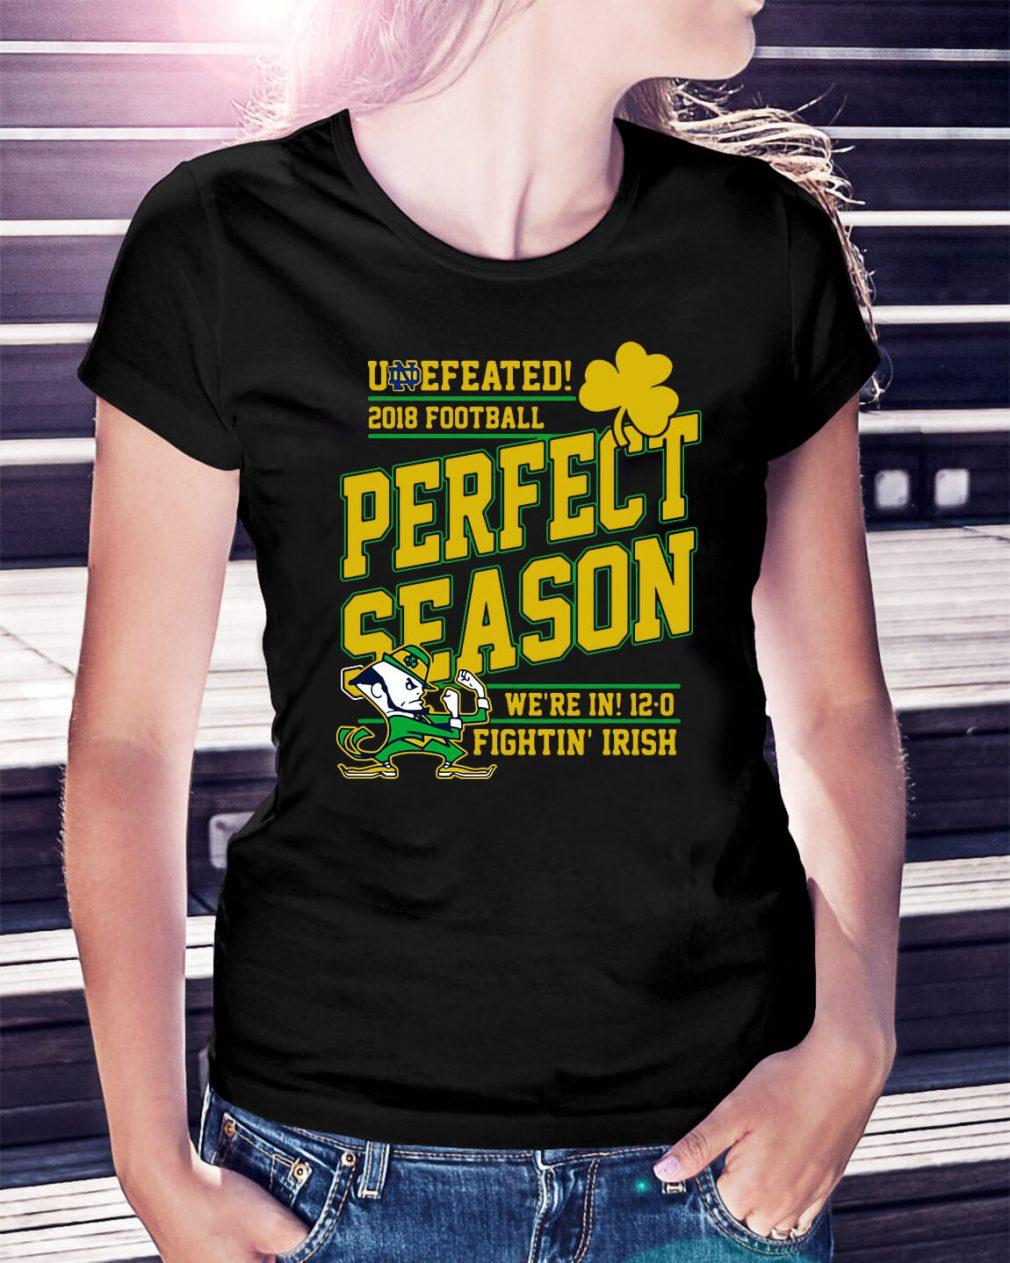 Undefeated 2018 football perfect season we're in 12-0 fightin' Irish Ladies Tee